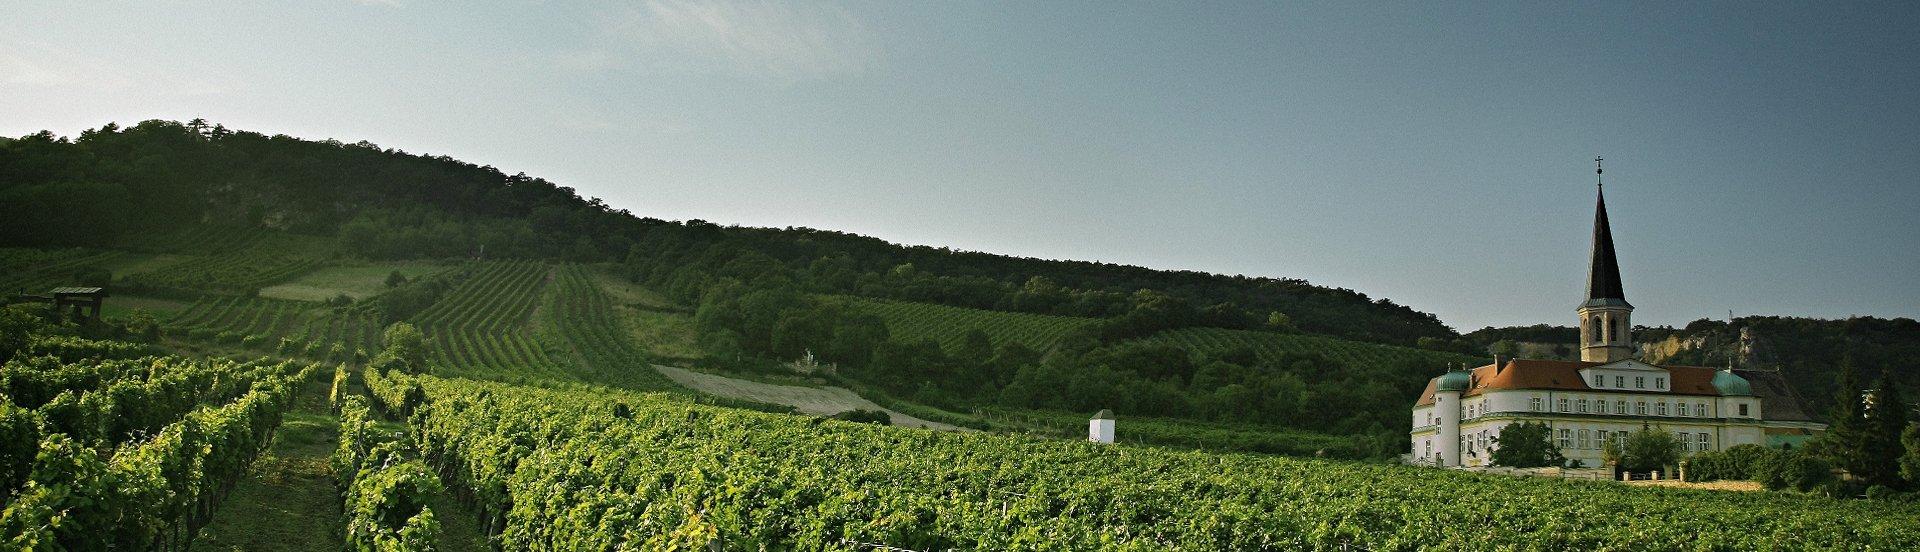 Weingarten Gumpoldskirchen